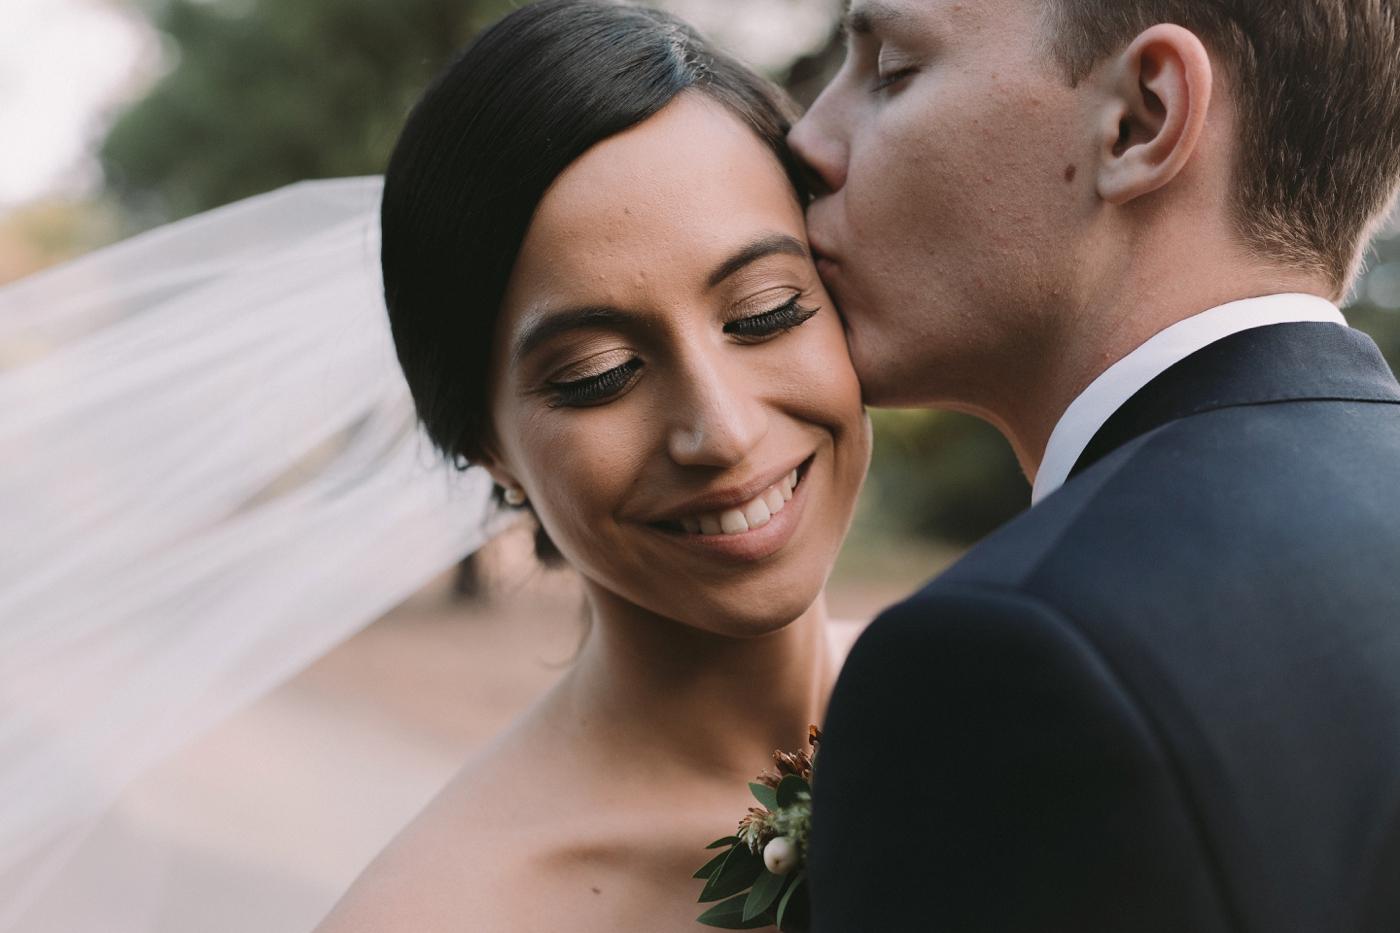 Jasmine and Adam - Natural wedding photographer in Adelaide - Candid Wedding Photographer Adelaide - www.katherineschultzphotography.com 45